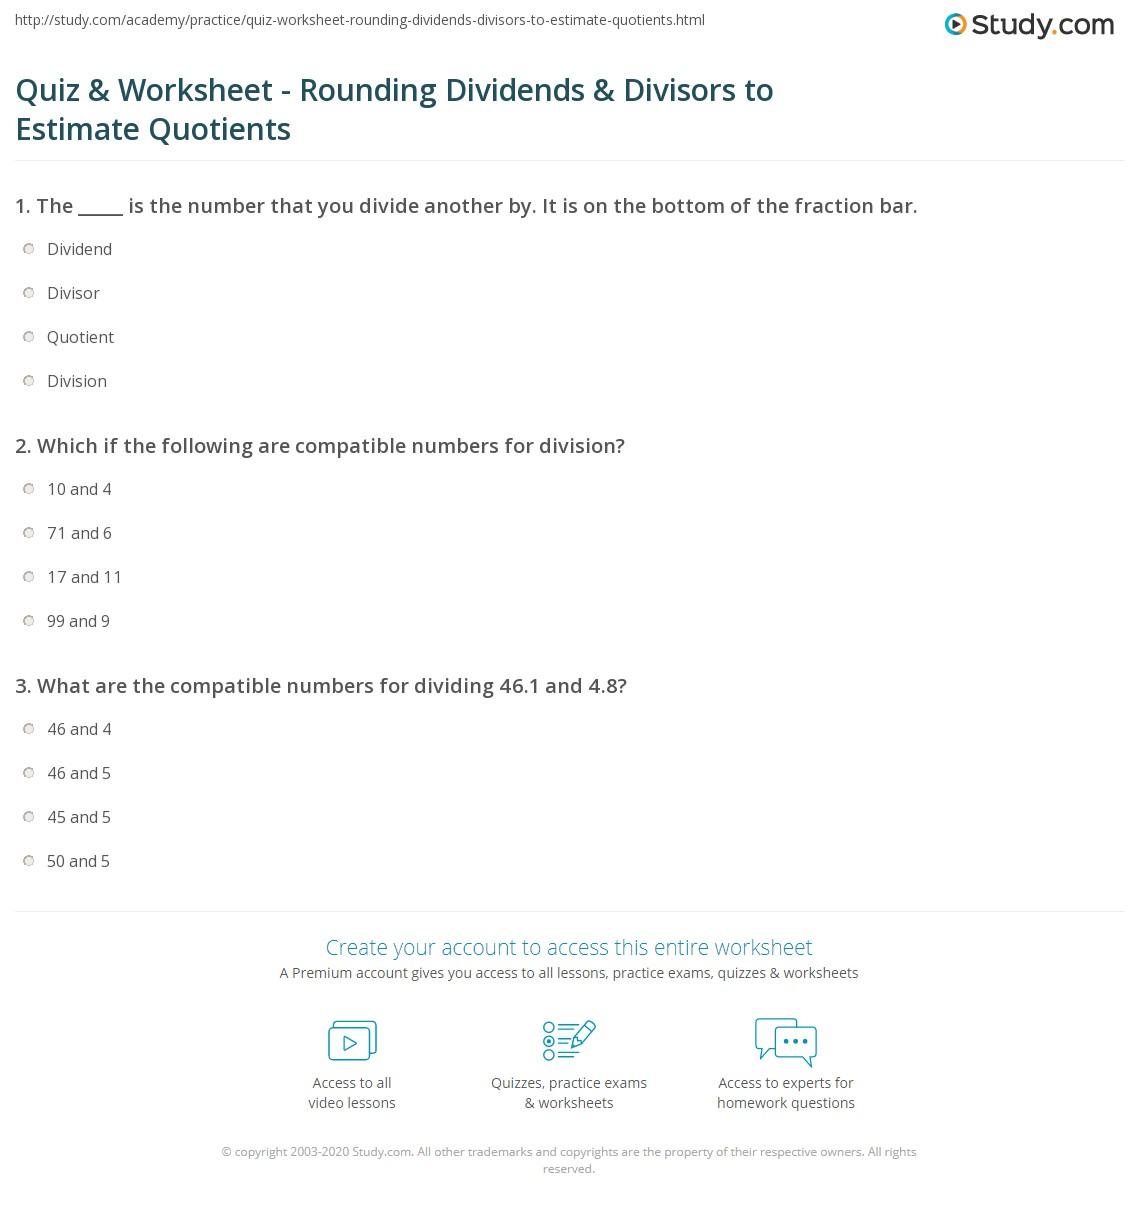 Quiz & Worksheet - Rounding Dividends & Divisors to Estimate ...